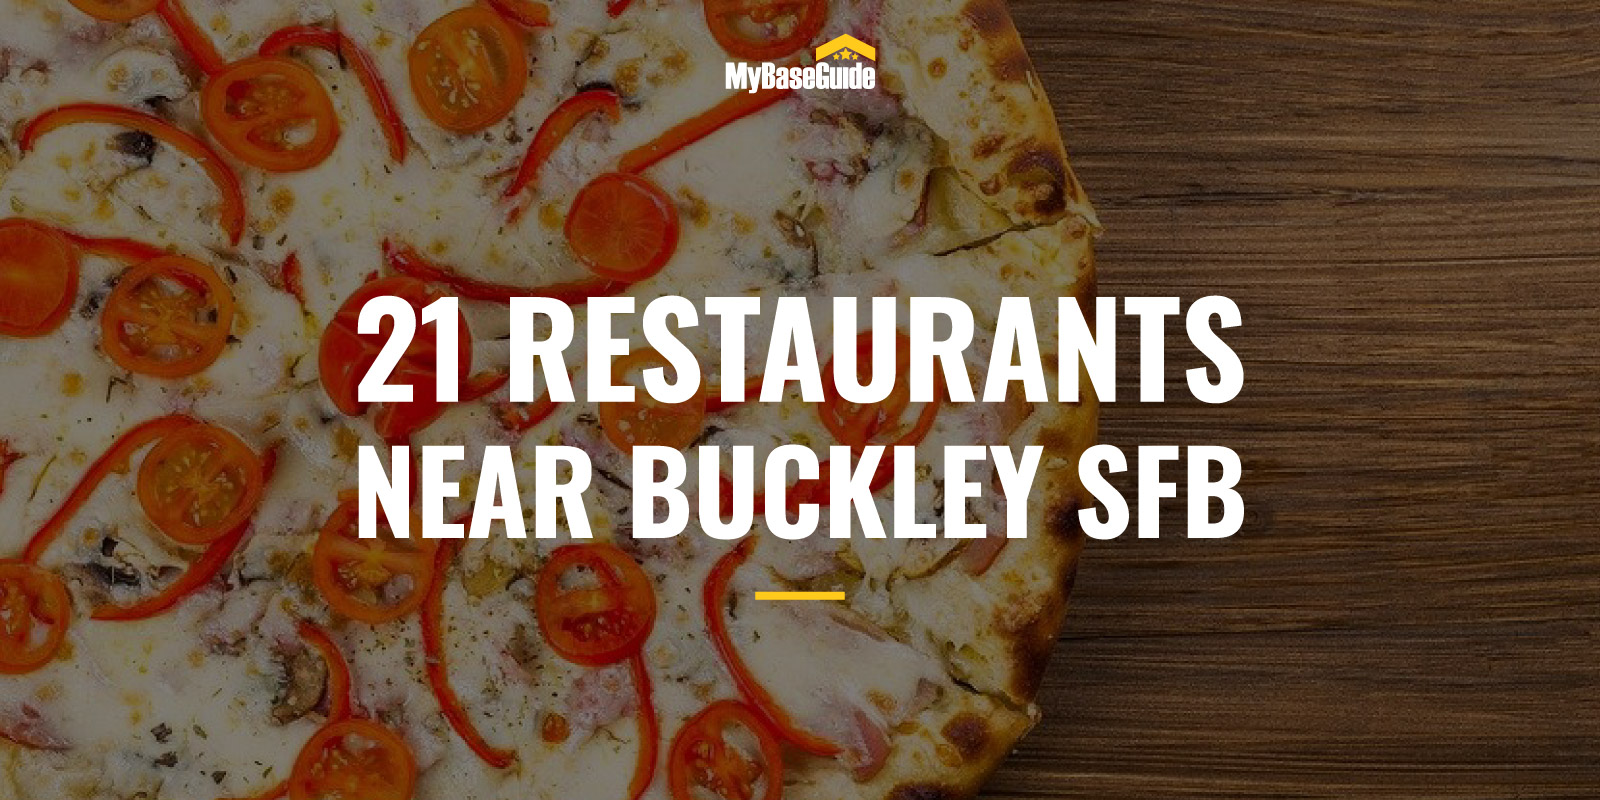 21 Restaurants Near Buckley AFB (Now Buckley Space Force Base)